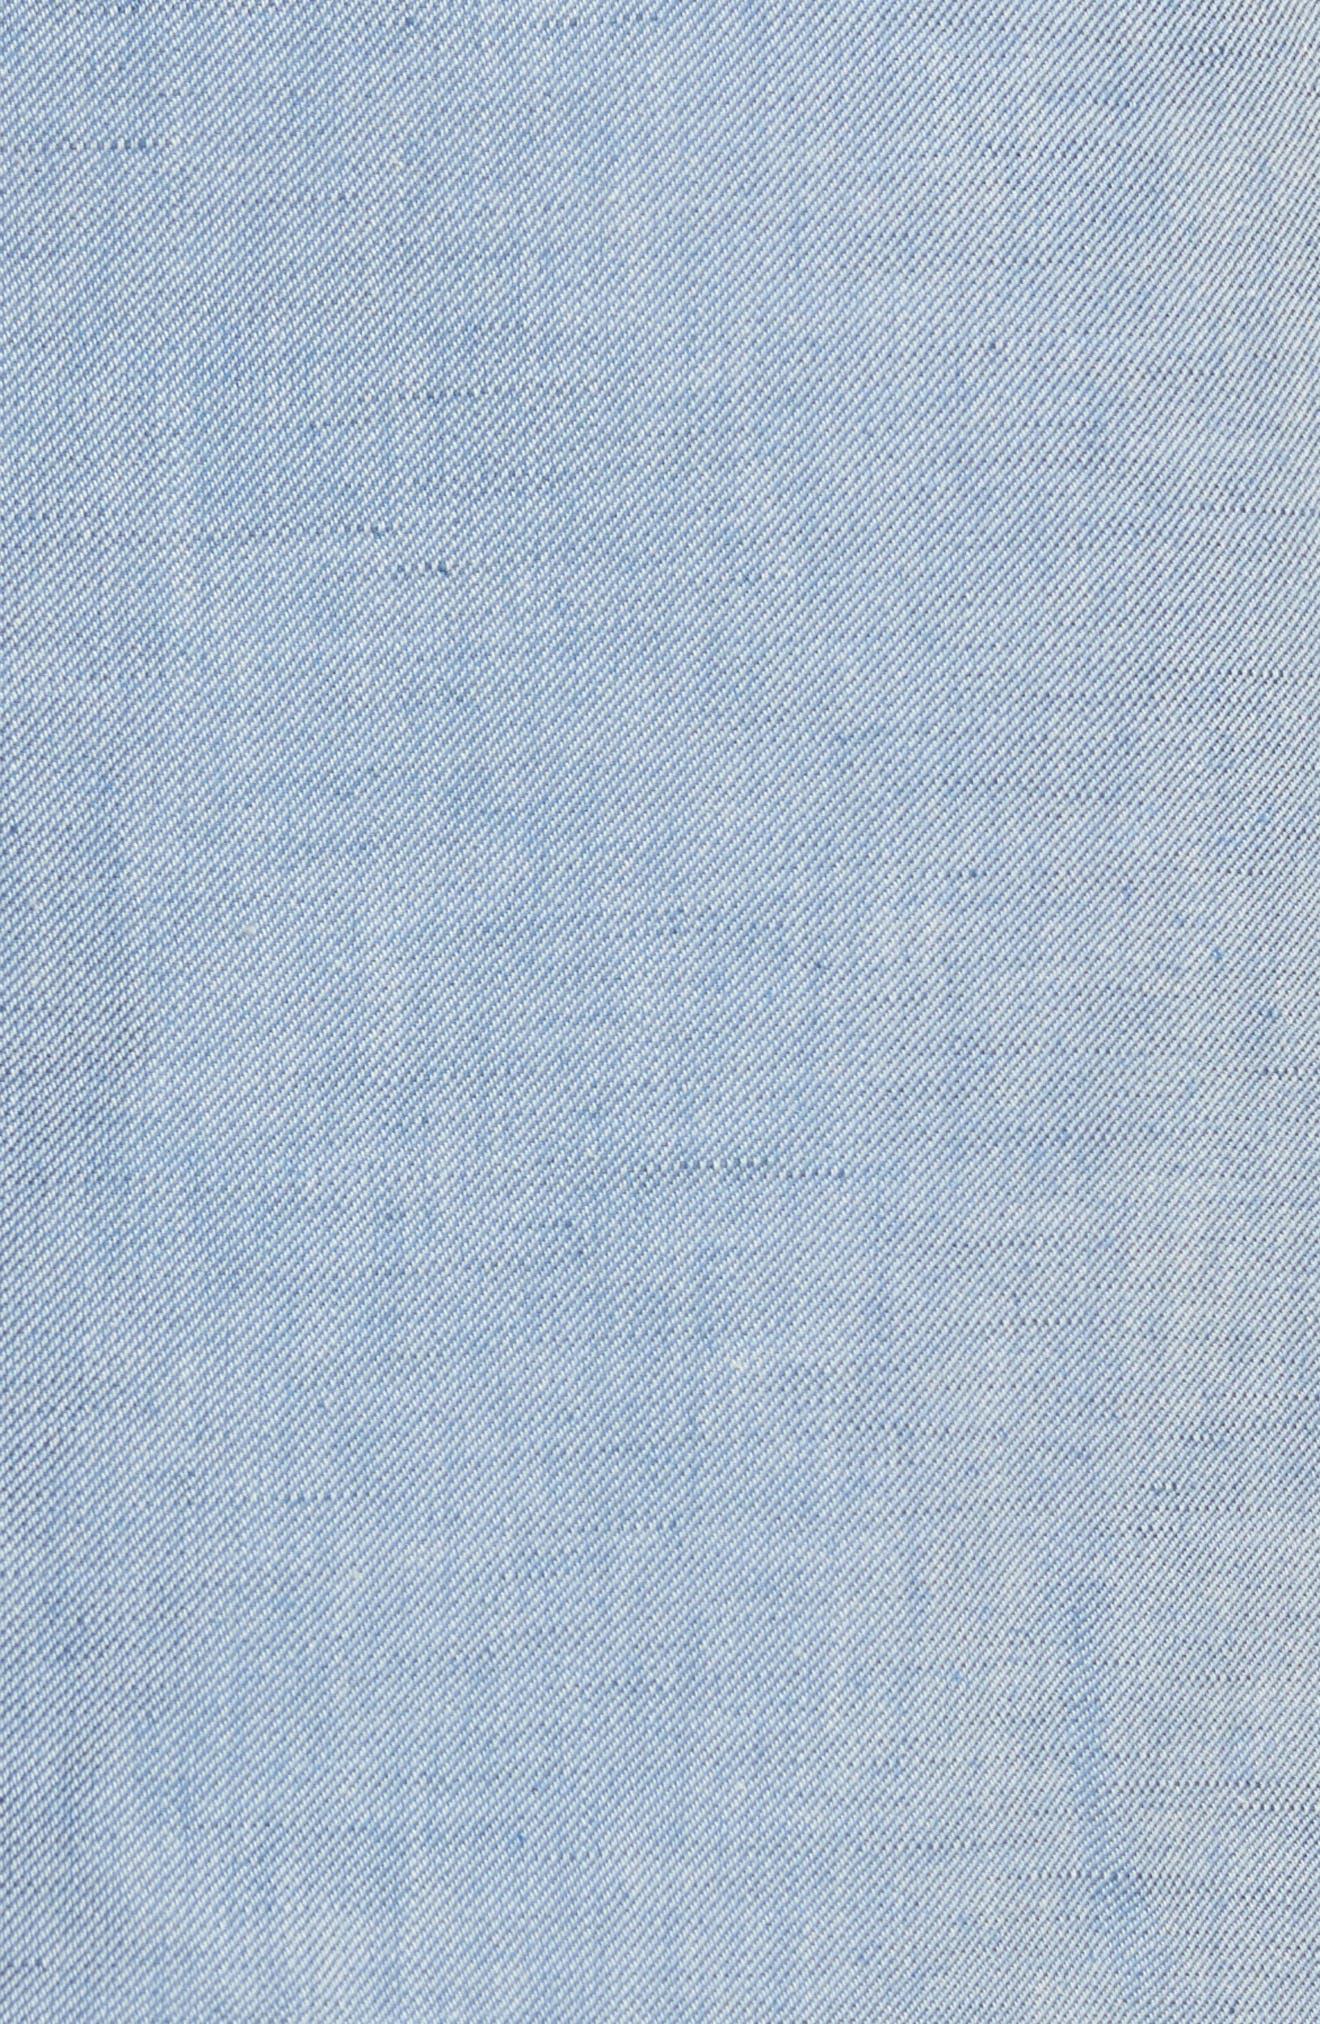 Jupe Genou Skirt,                             Alternate thumbnail 5, color,                             Bleu Acier